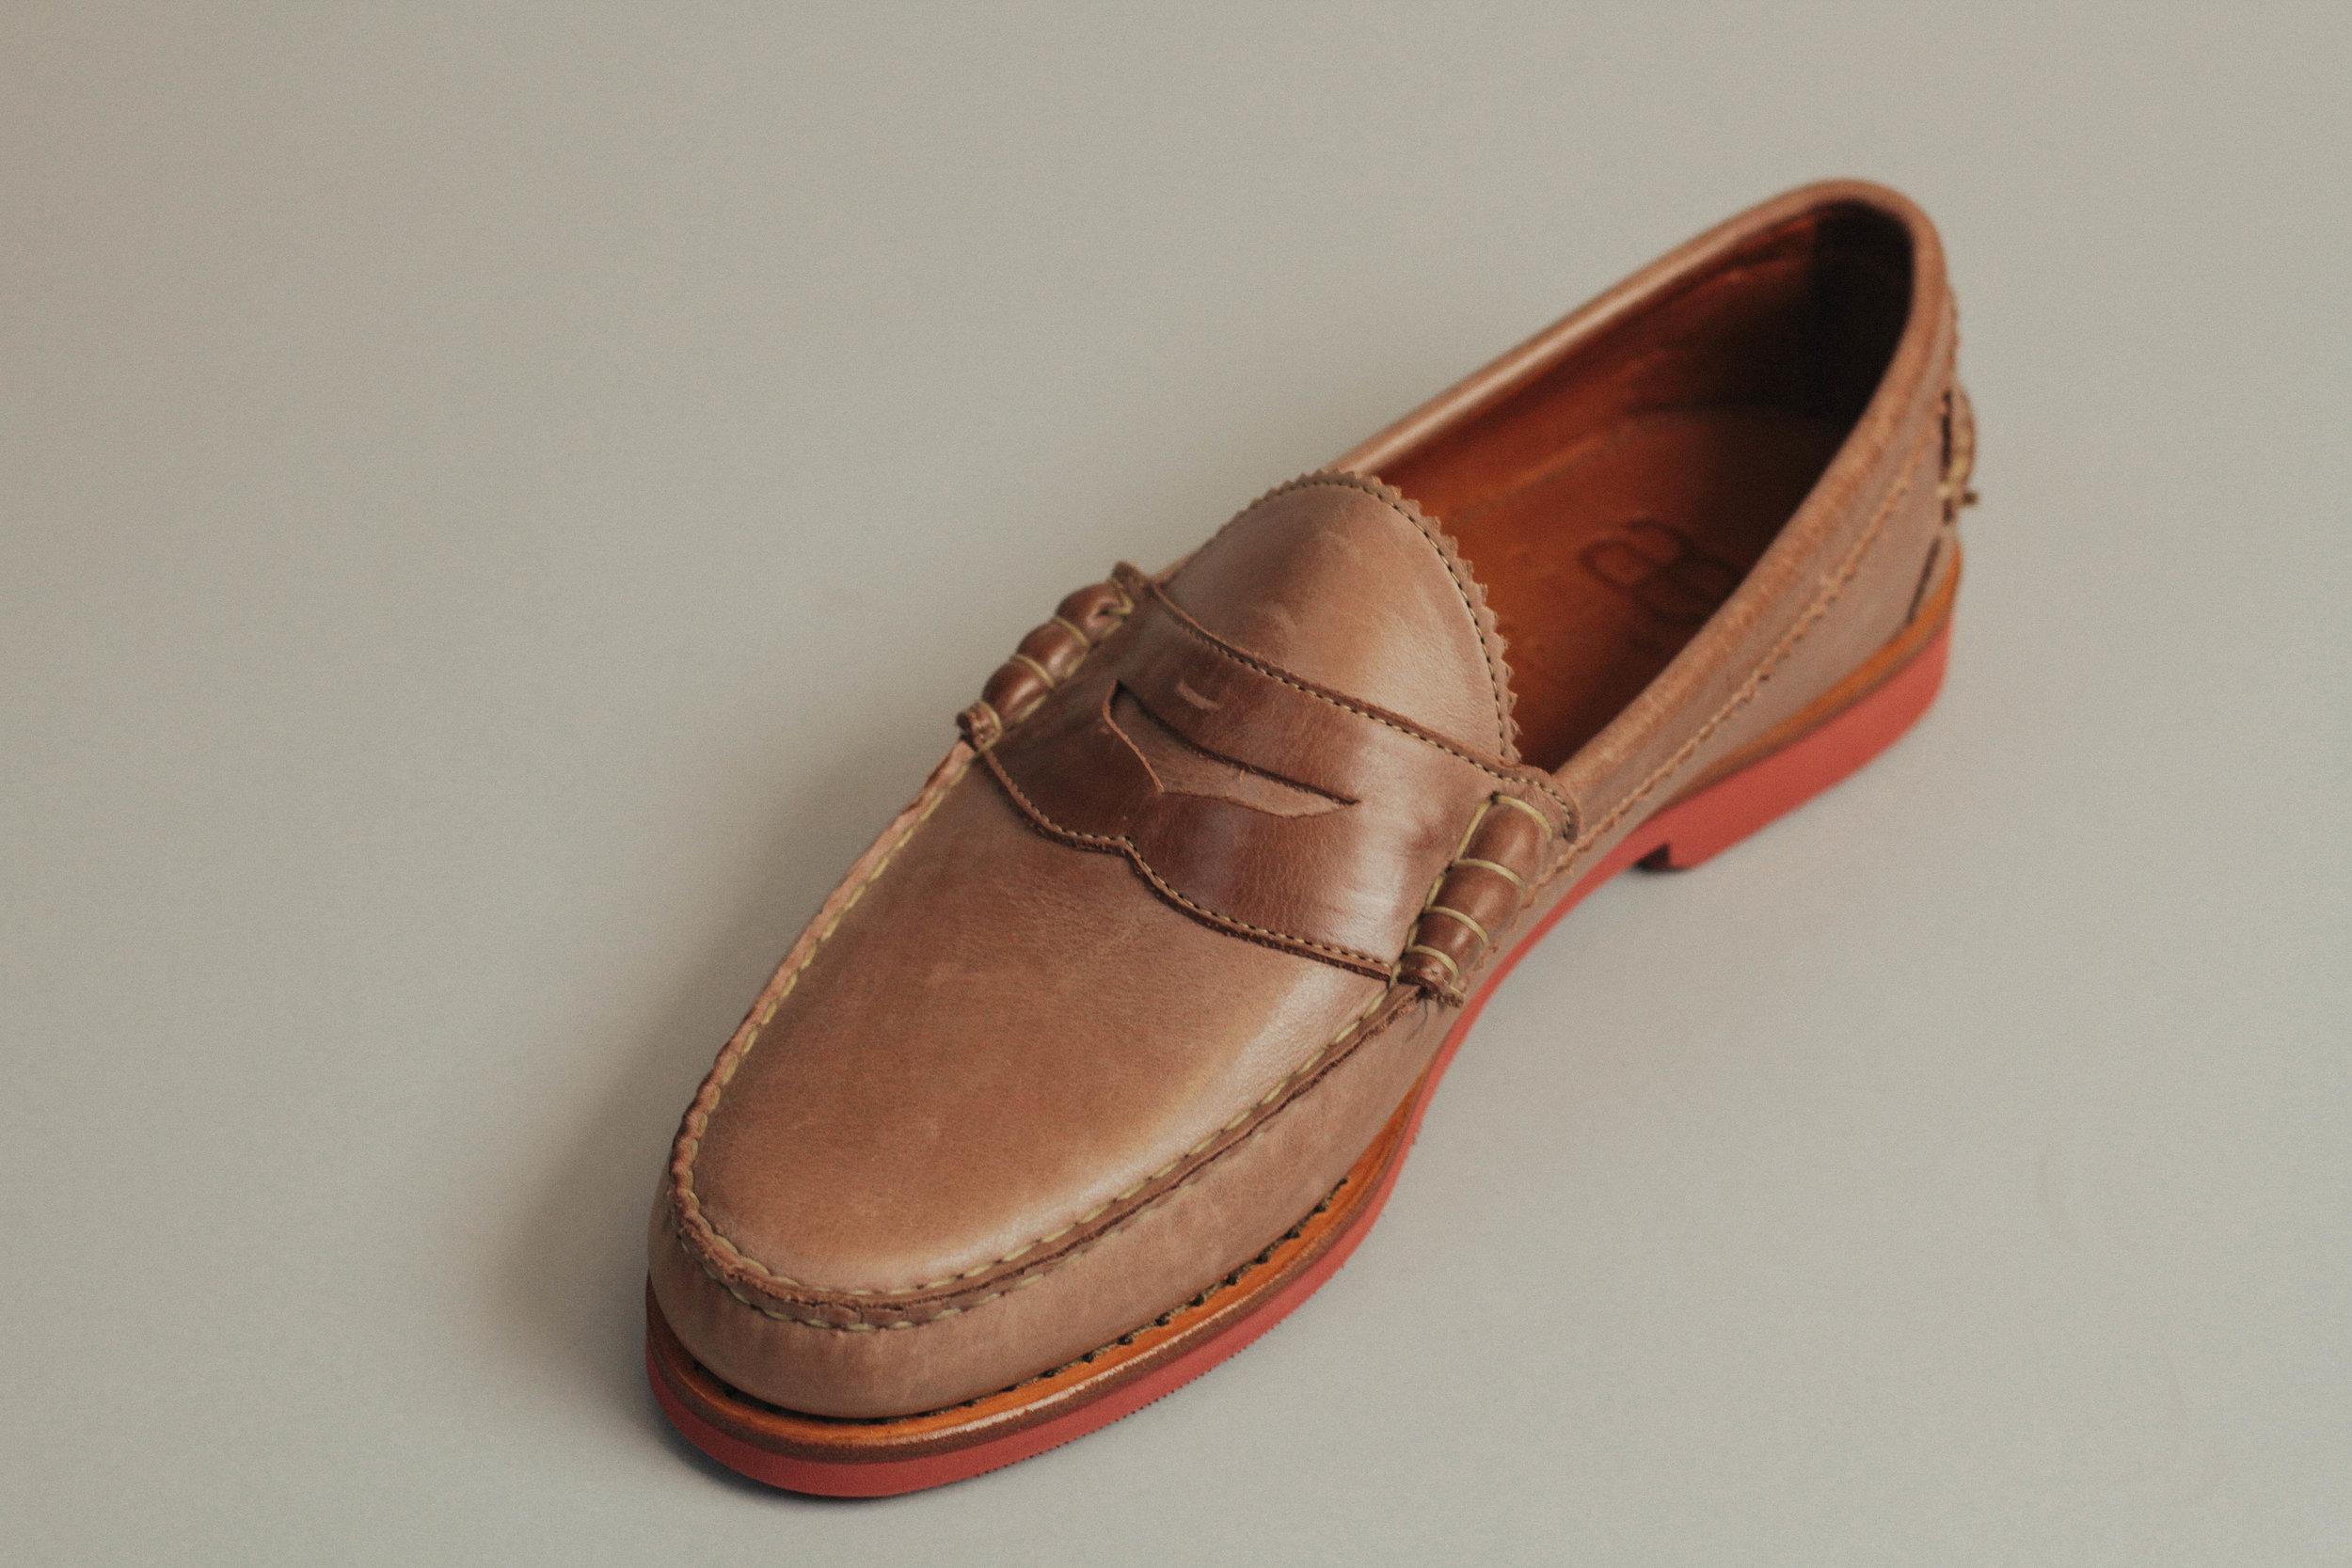 shoes-6.jpg